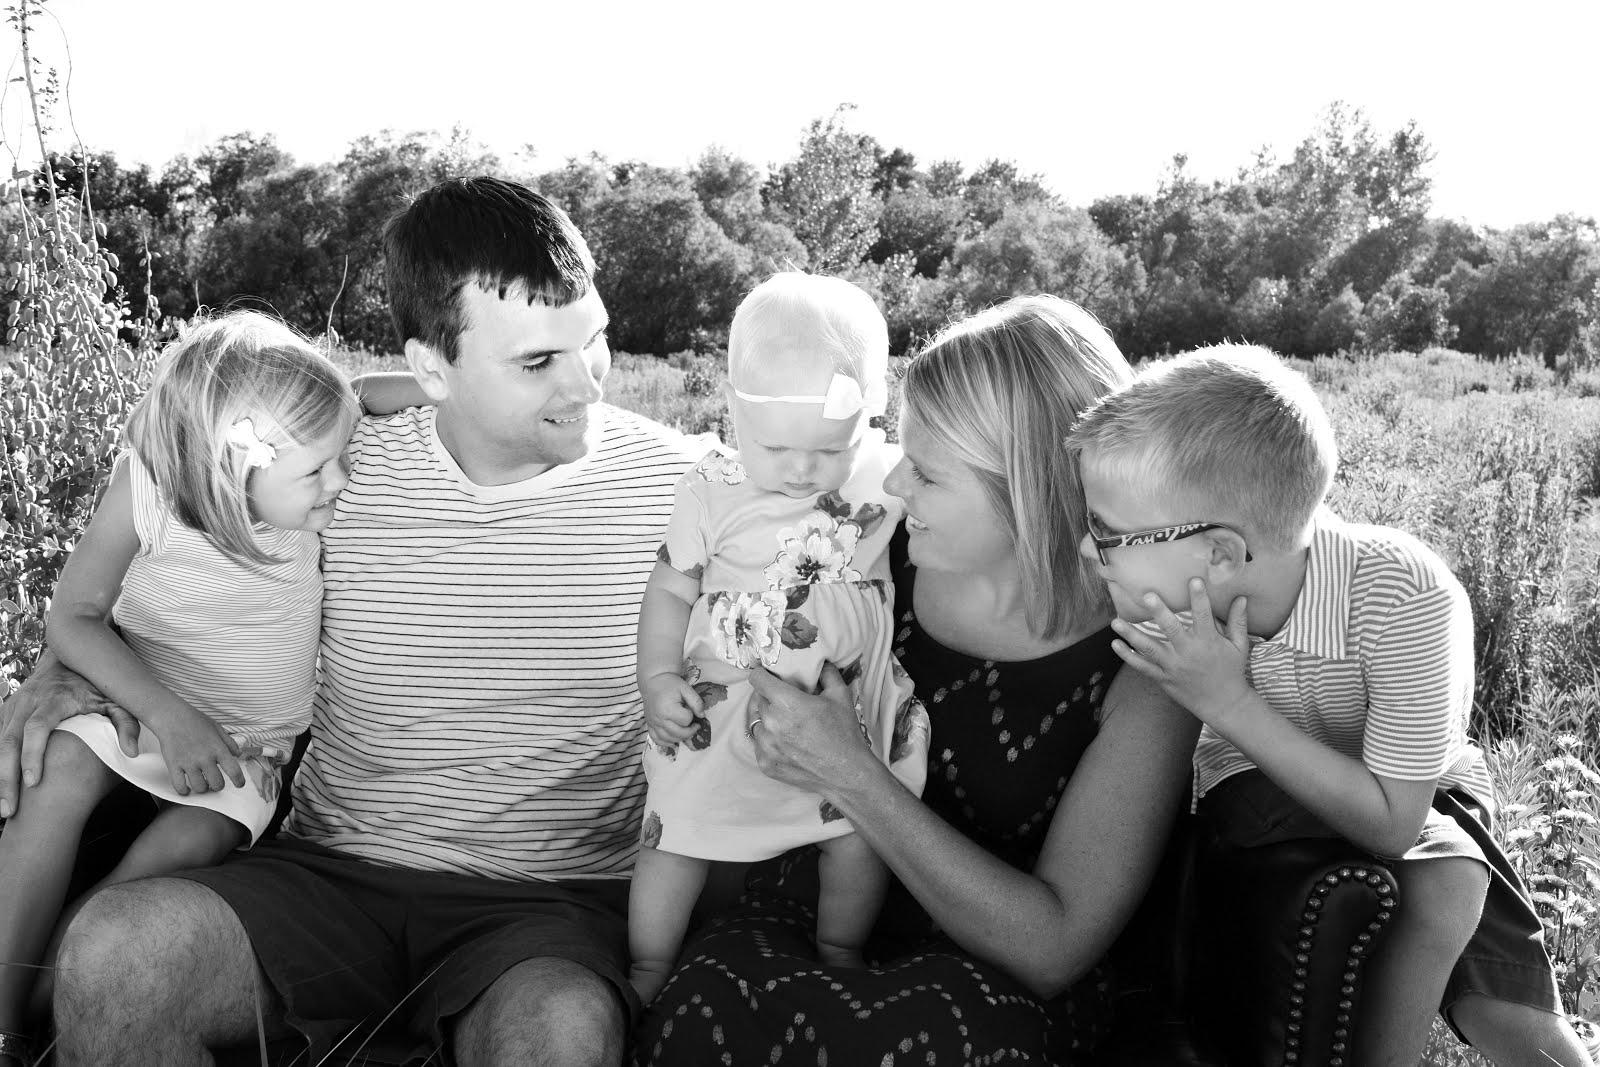 Sharing Faith, Family & Fun So We All Can Enjoy A Joy-Filled Life Now